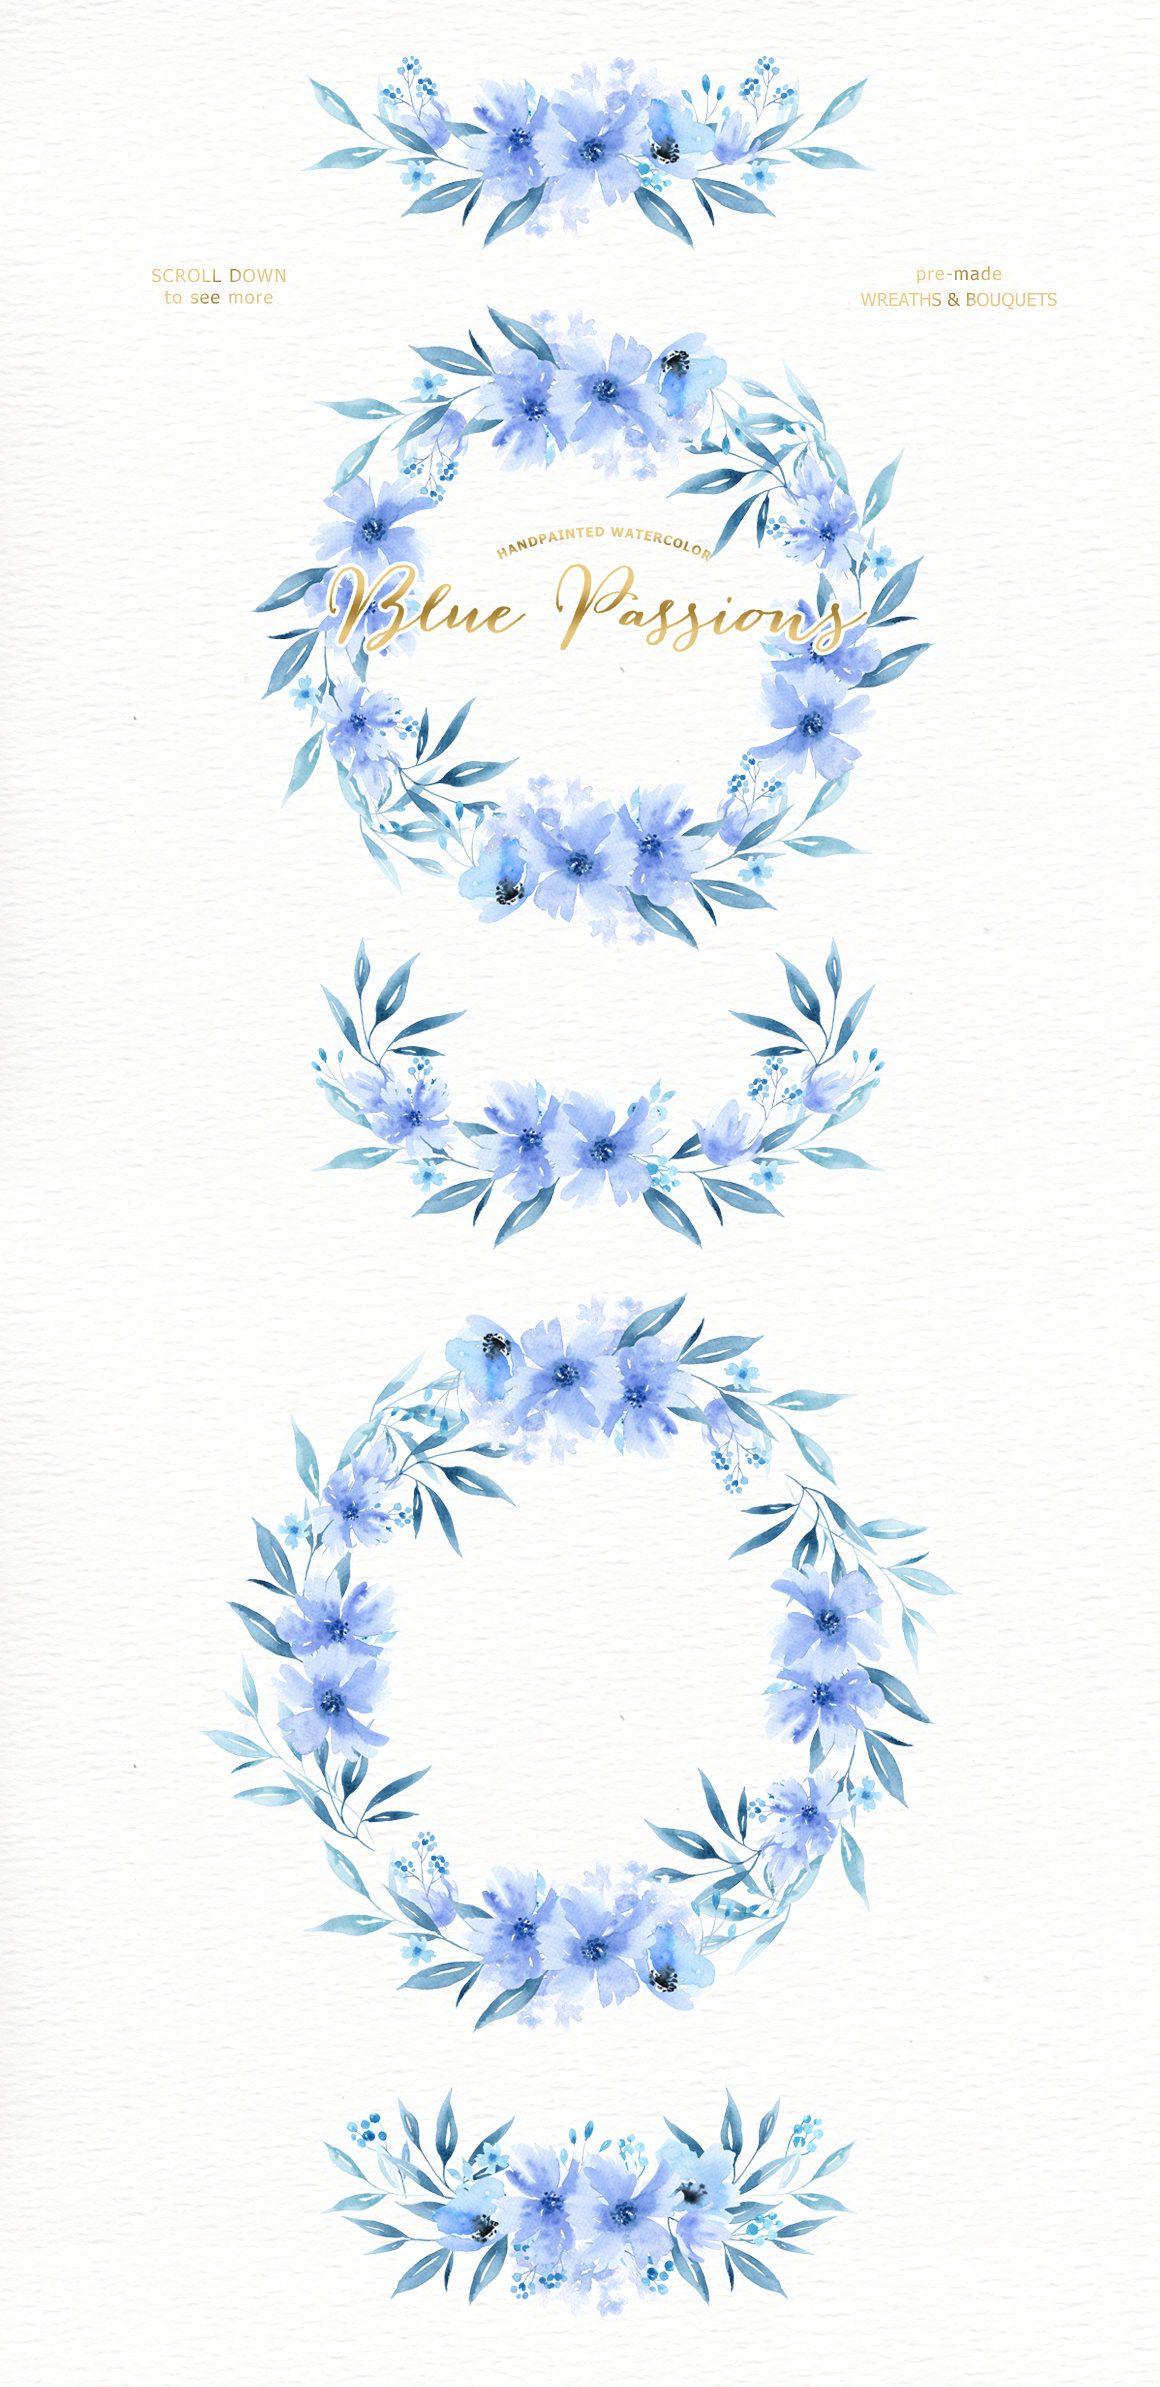 Holiday Wreath Watercolor